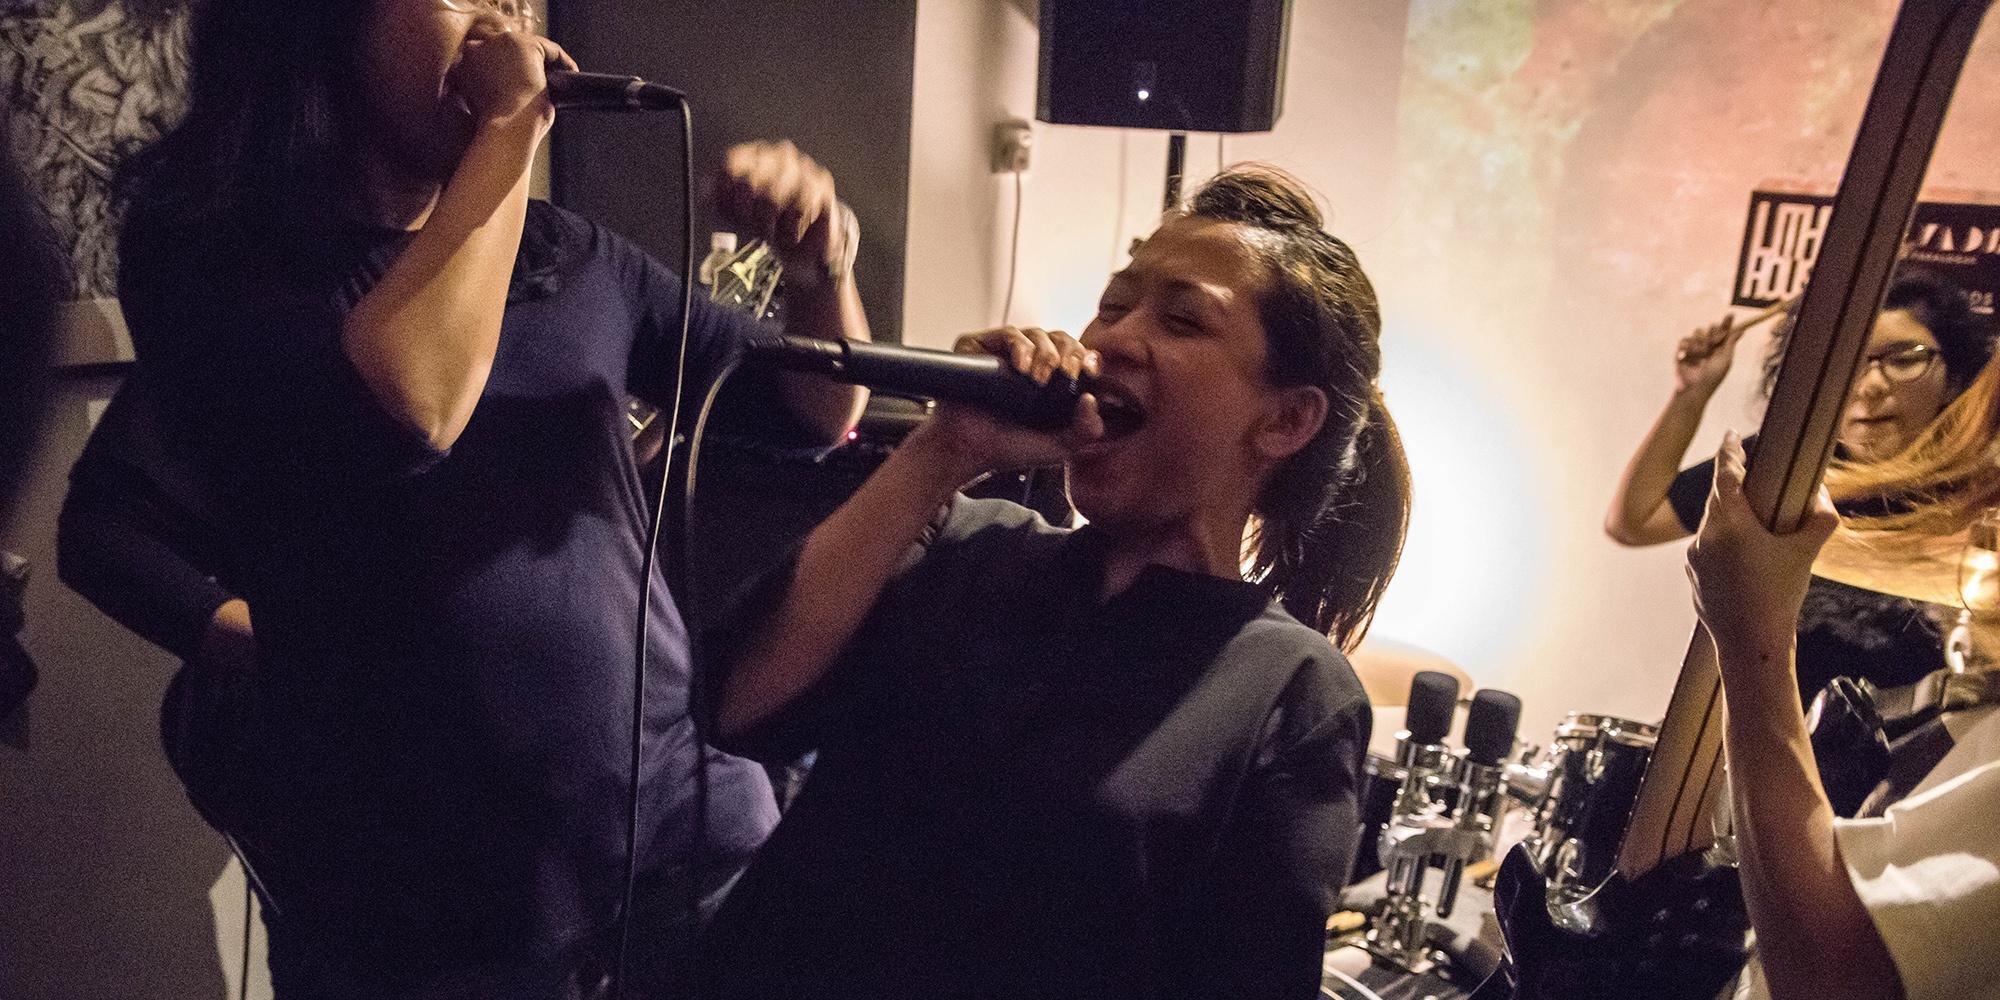 PHOTO GALLERY: Singapore all-female hardcore originators Obstacle Upsurge's EP launch